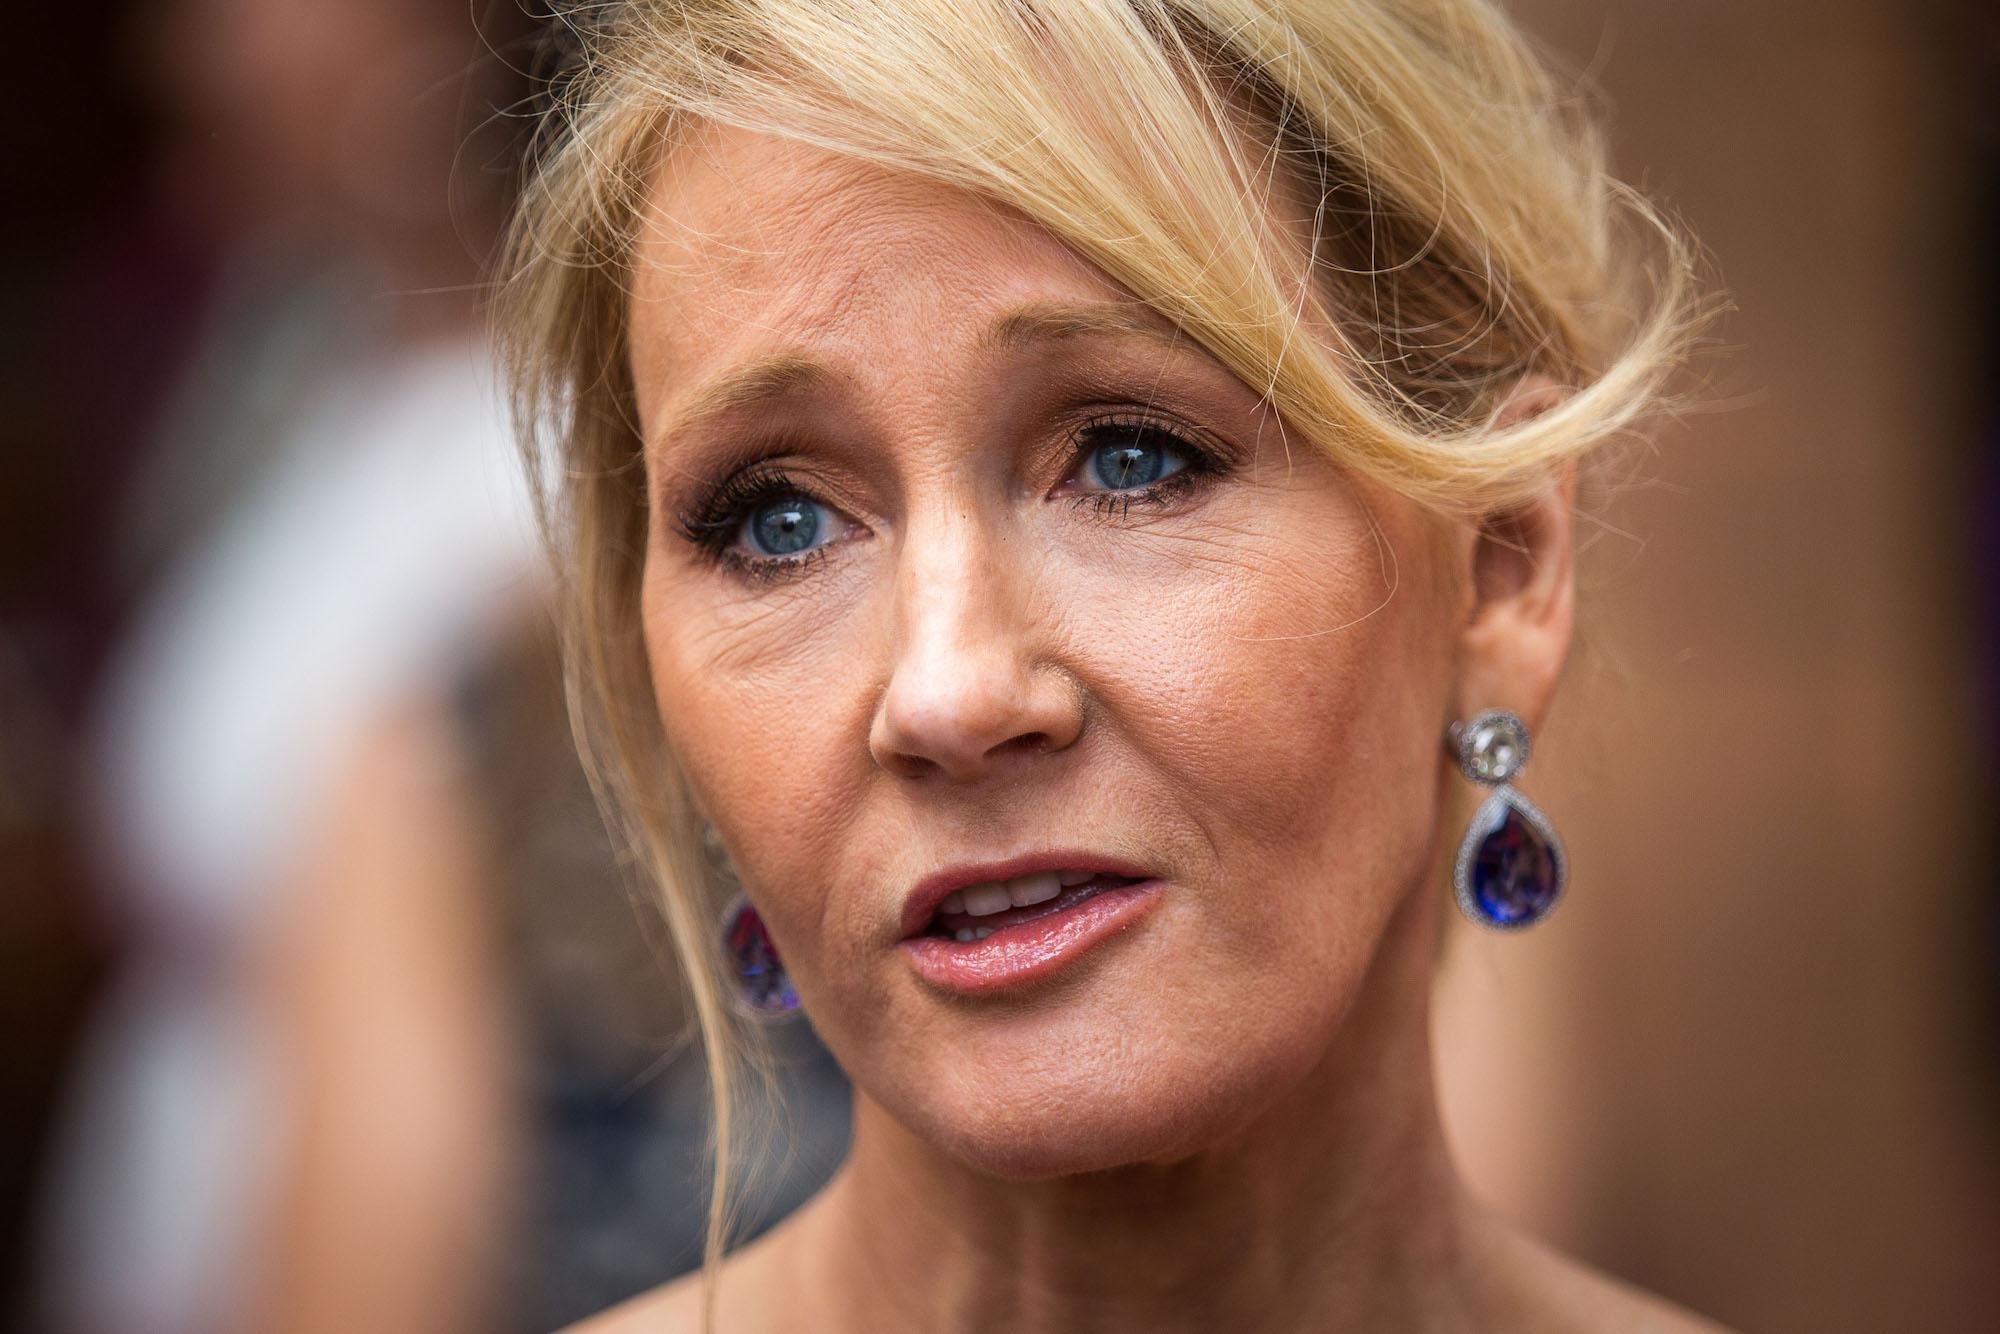 J.K. Rowling, autora de la saga de libros de Harry Potter